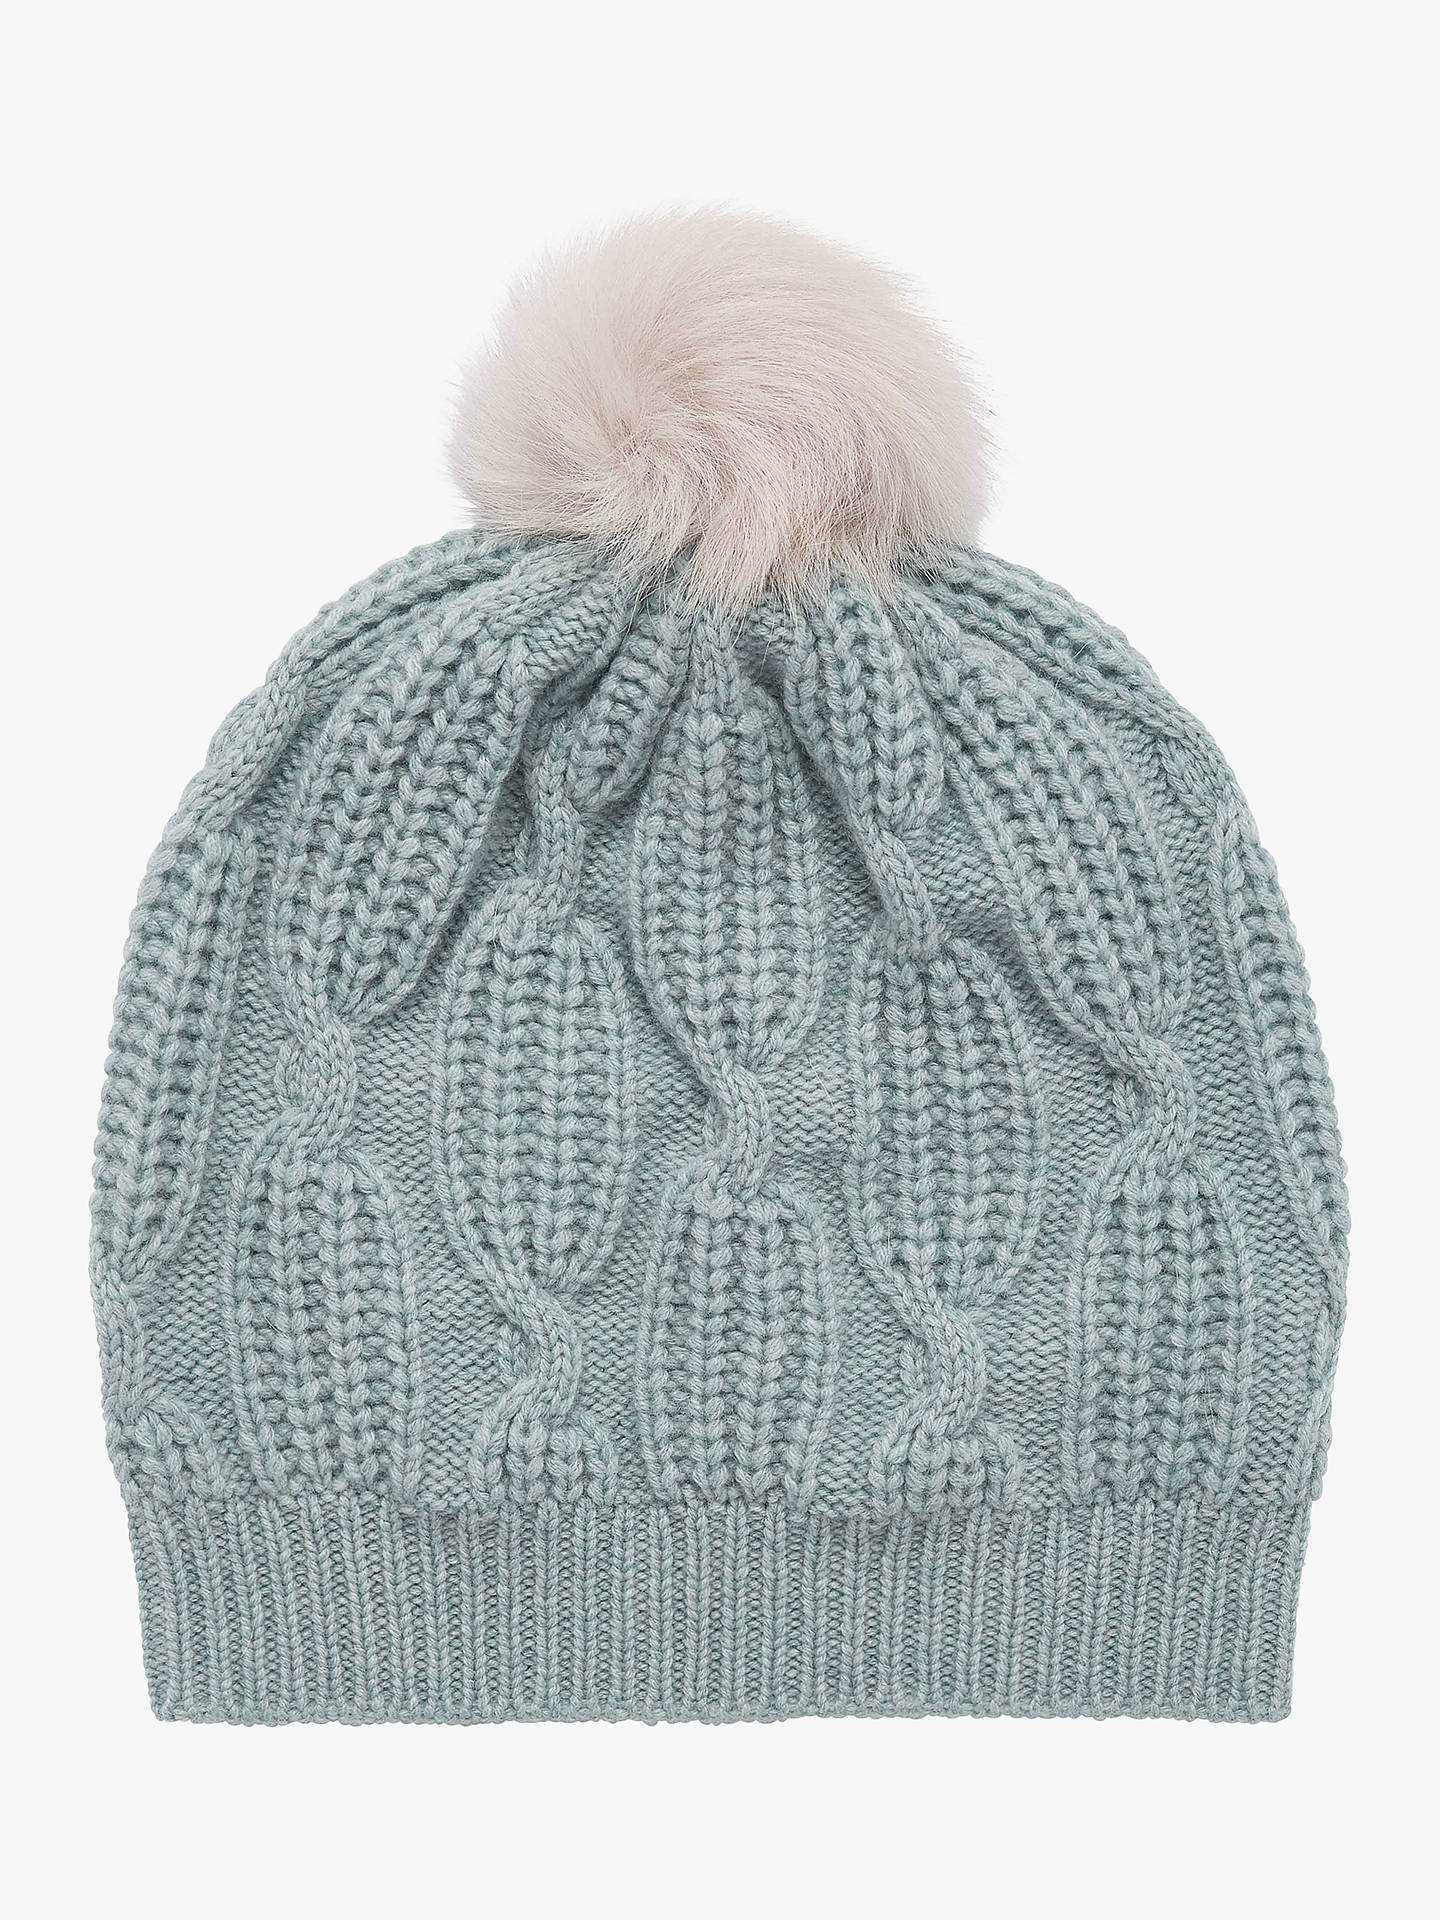 d5bcecaae9fdfd Buy Brora Cashmere Knit Pom-Pom Beanie Hat, Cloud Online at johnlewis.com  ...